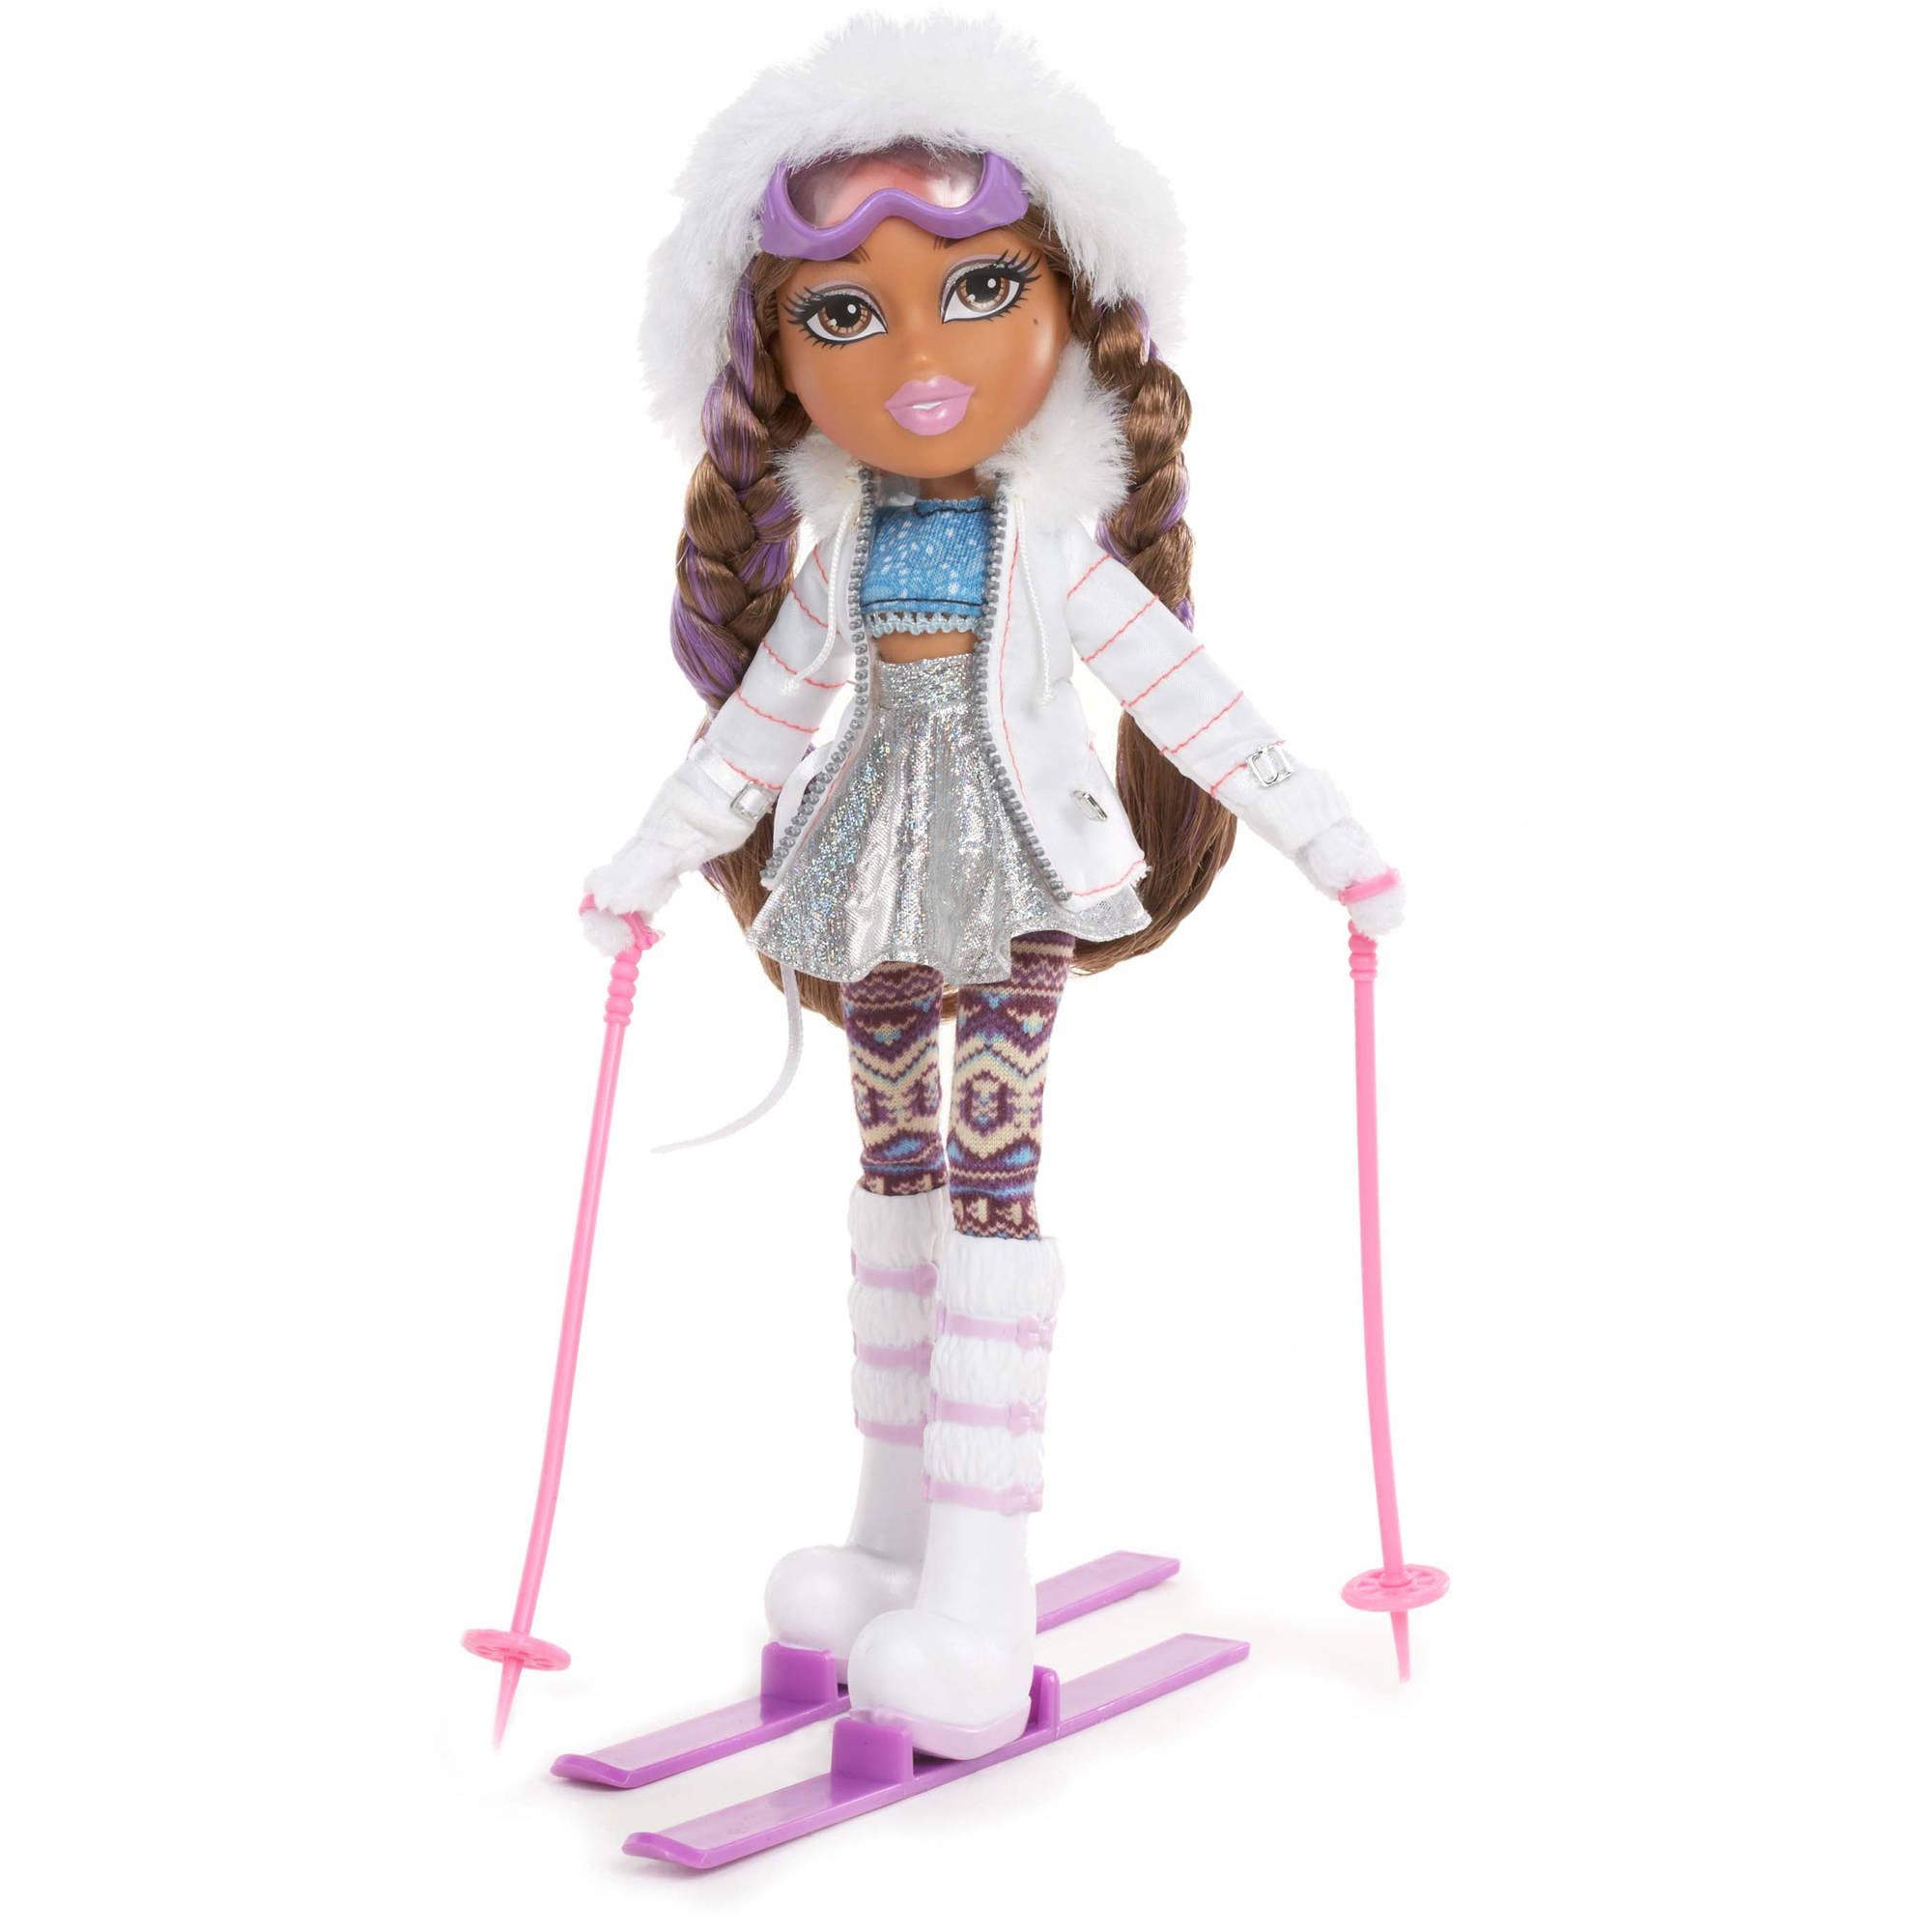 Bratz SnowKissed Doll, Yasmin